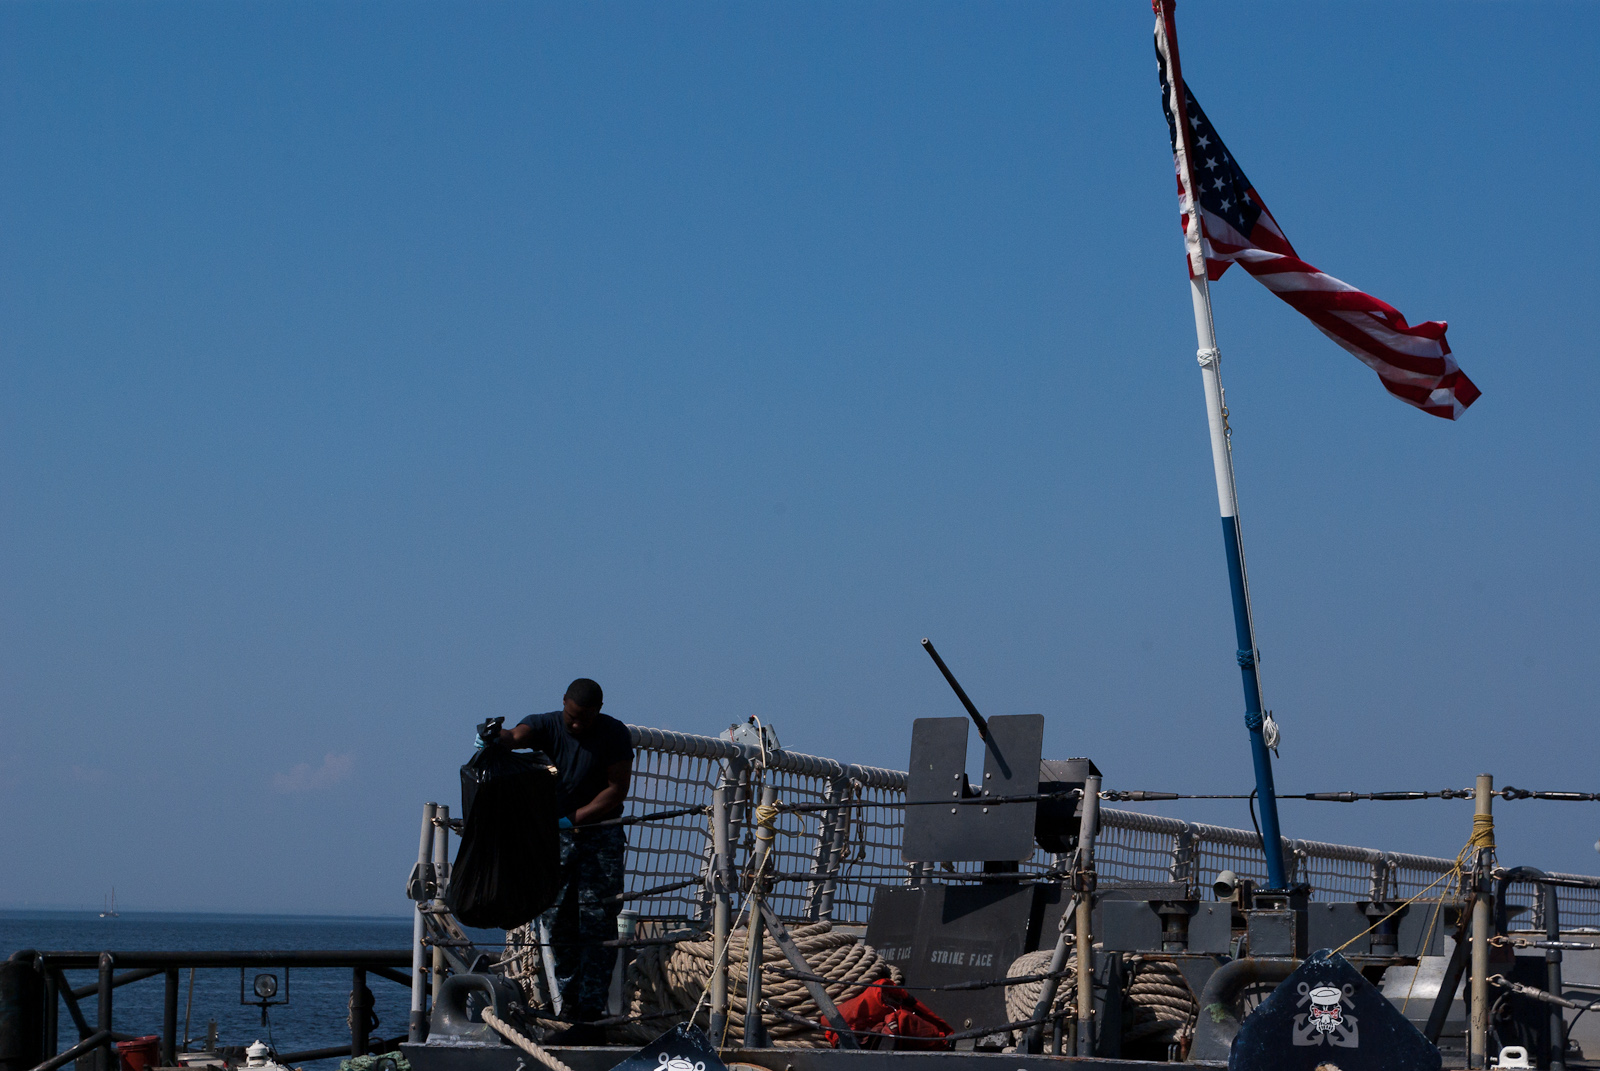 The 5th International Marine Show